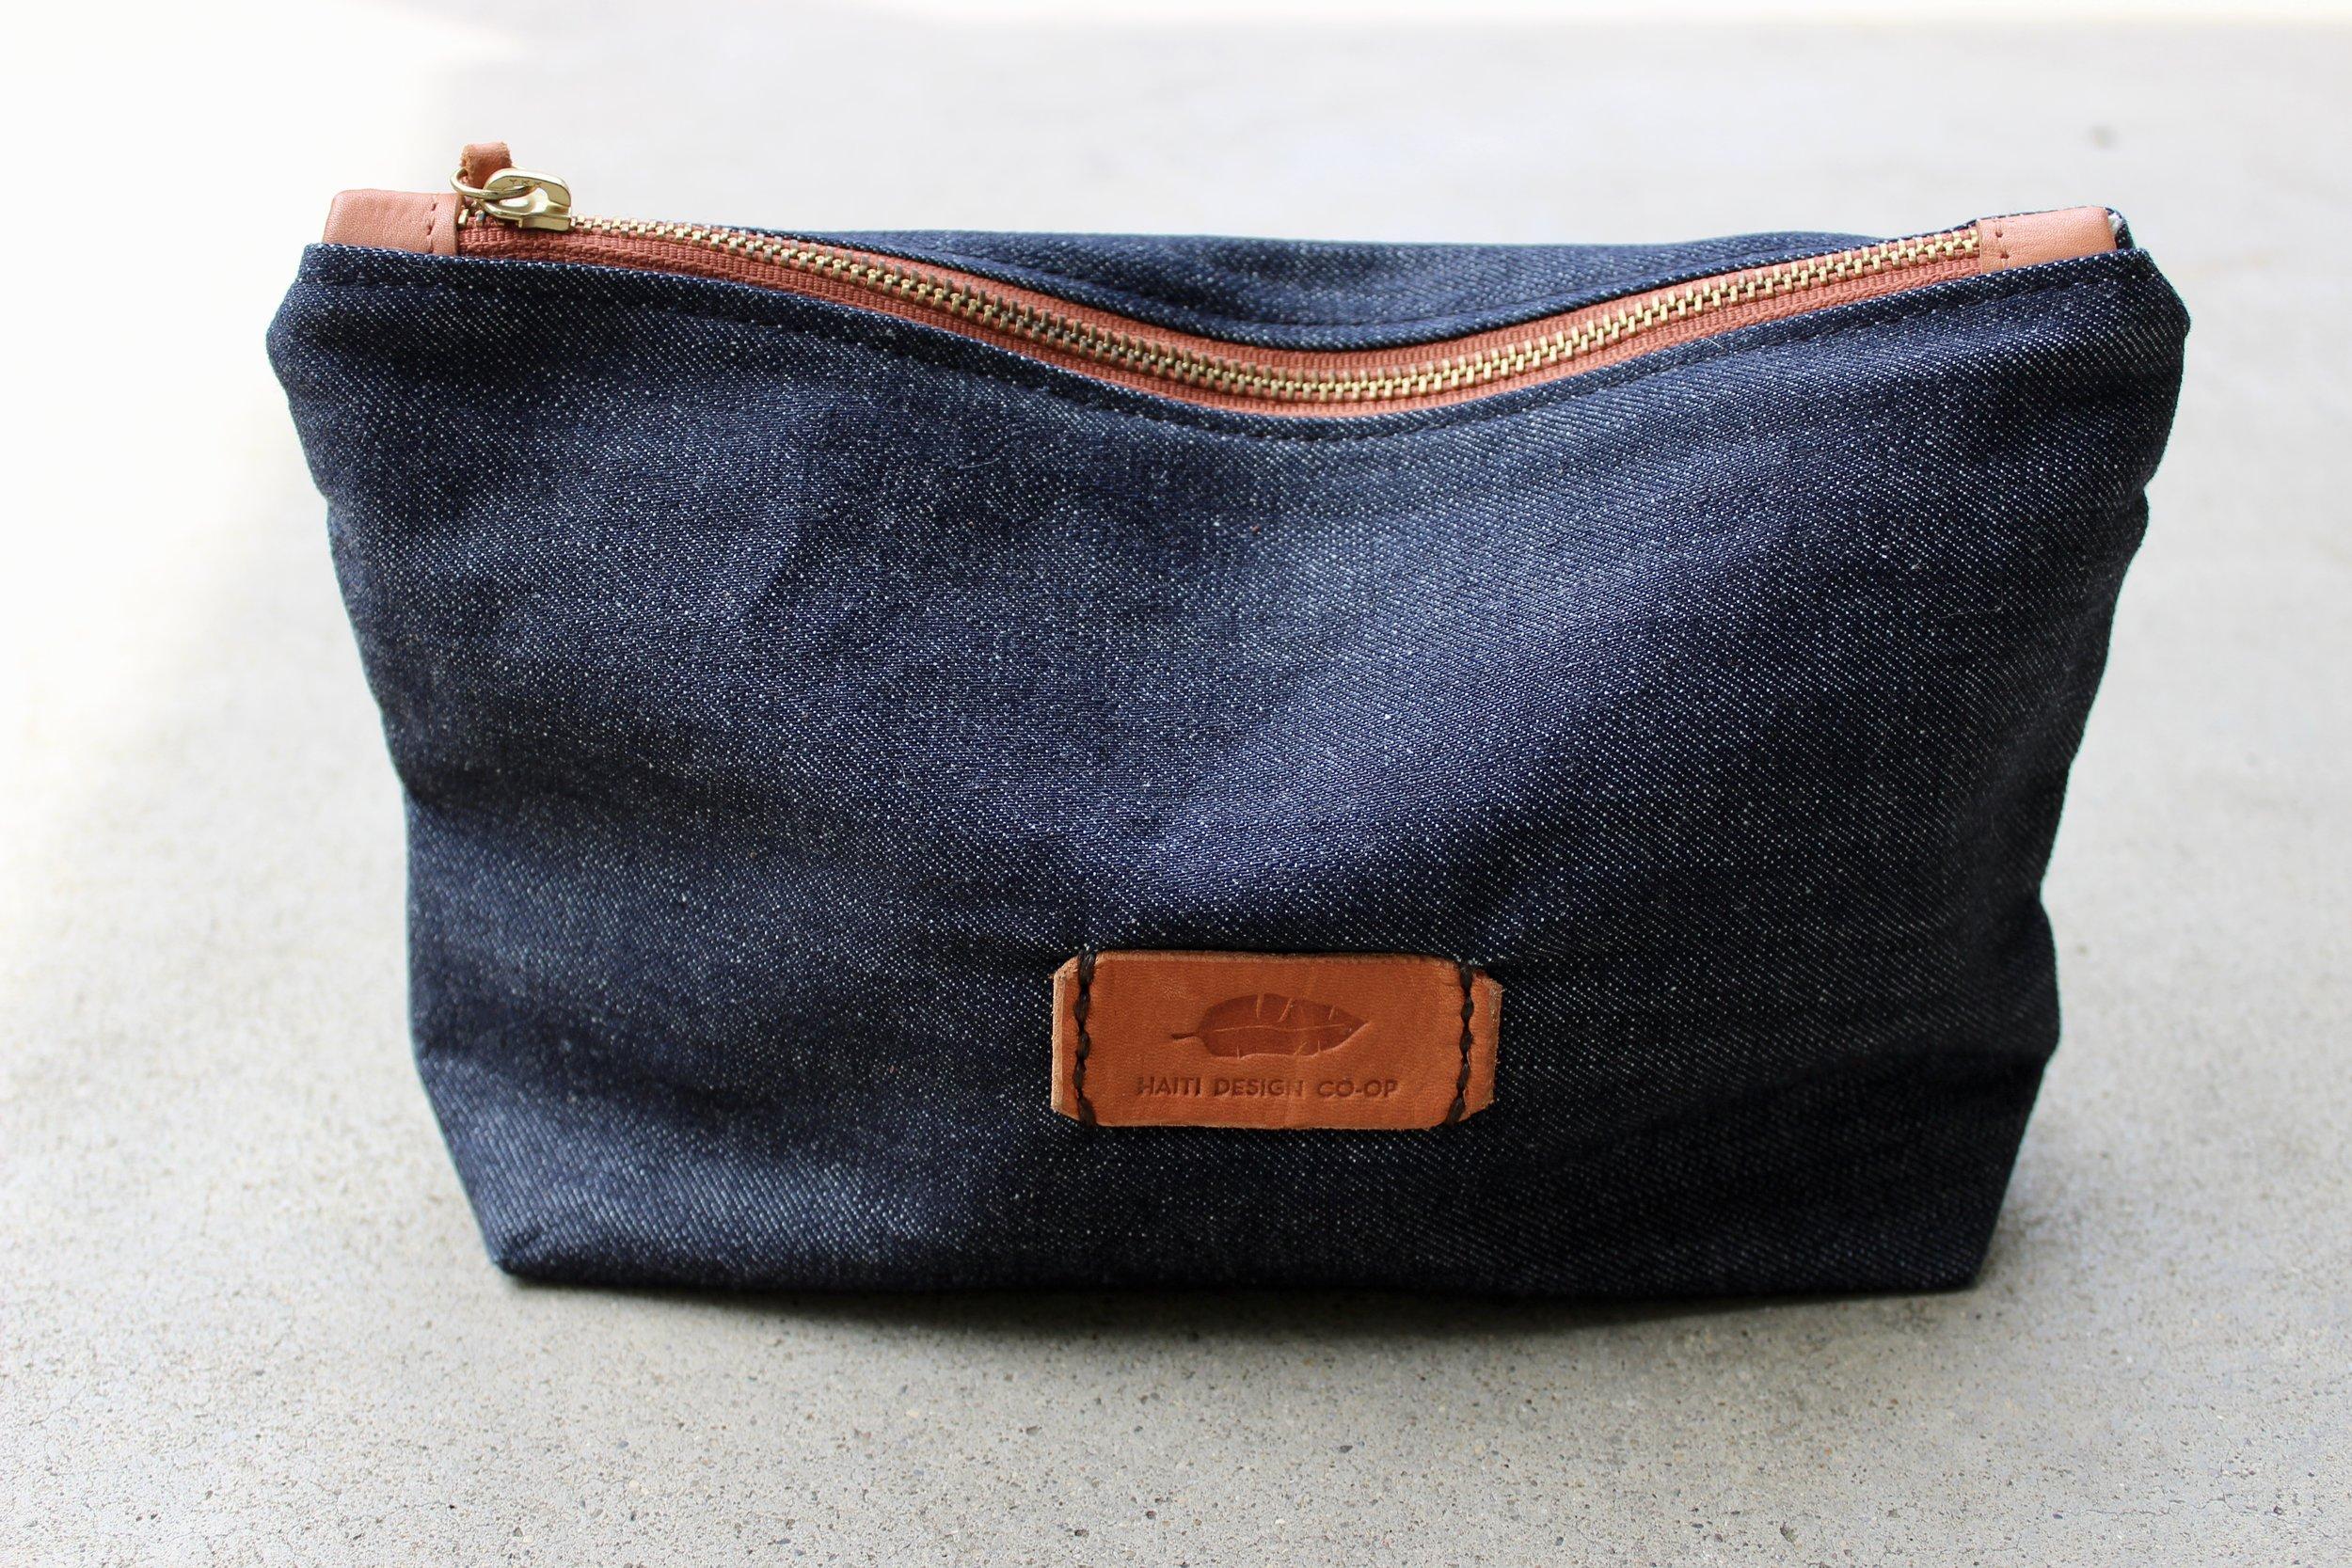 The Denim Bag